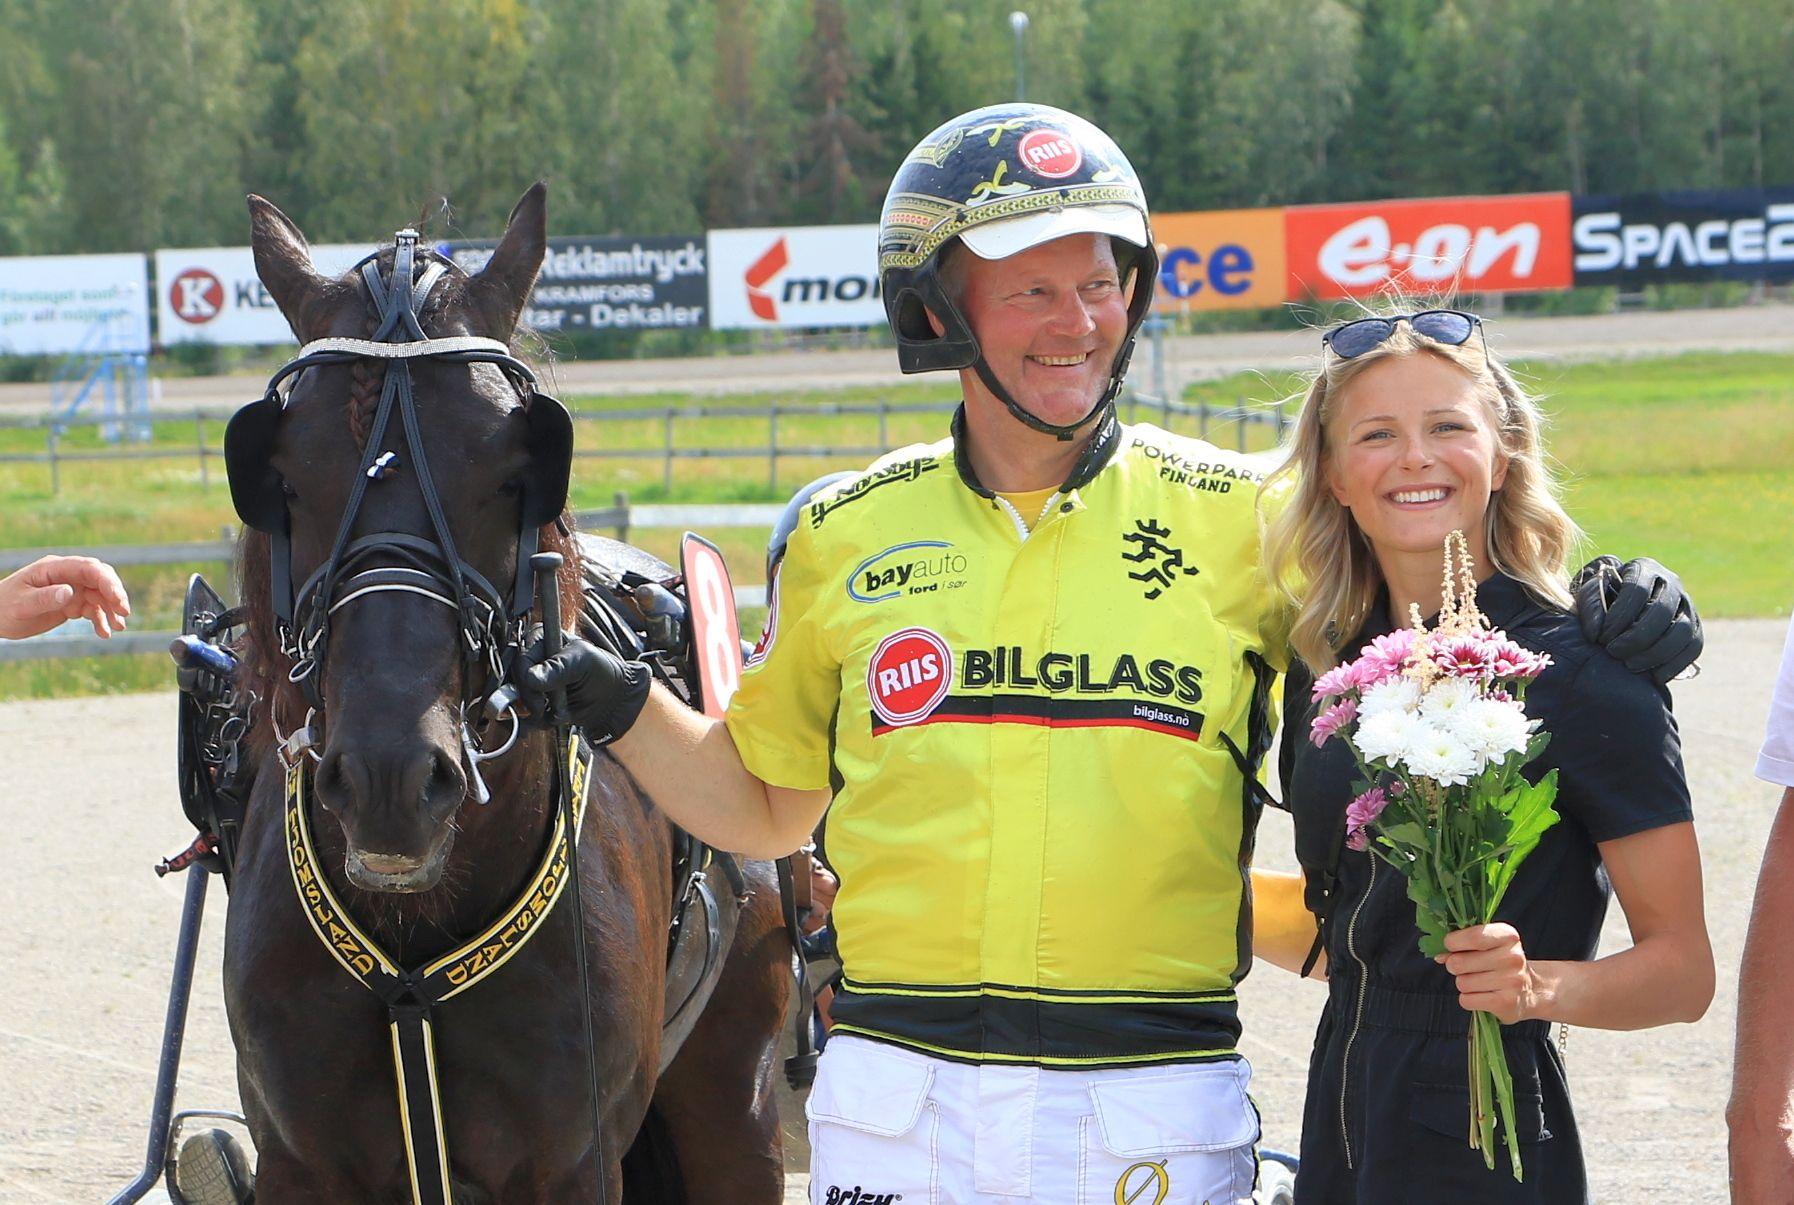 Øystein Tjomsland og Frida Karlsson etter seieren til Grisle Odin G.L. i kvalifiseringsløpet til Svensk Travkriterium. Søndag går finalen.